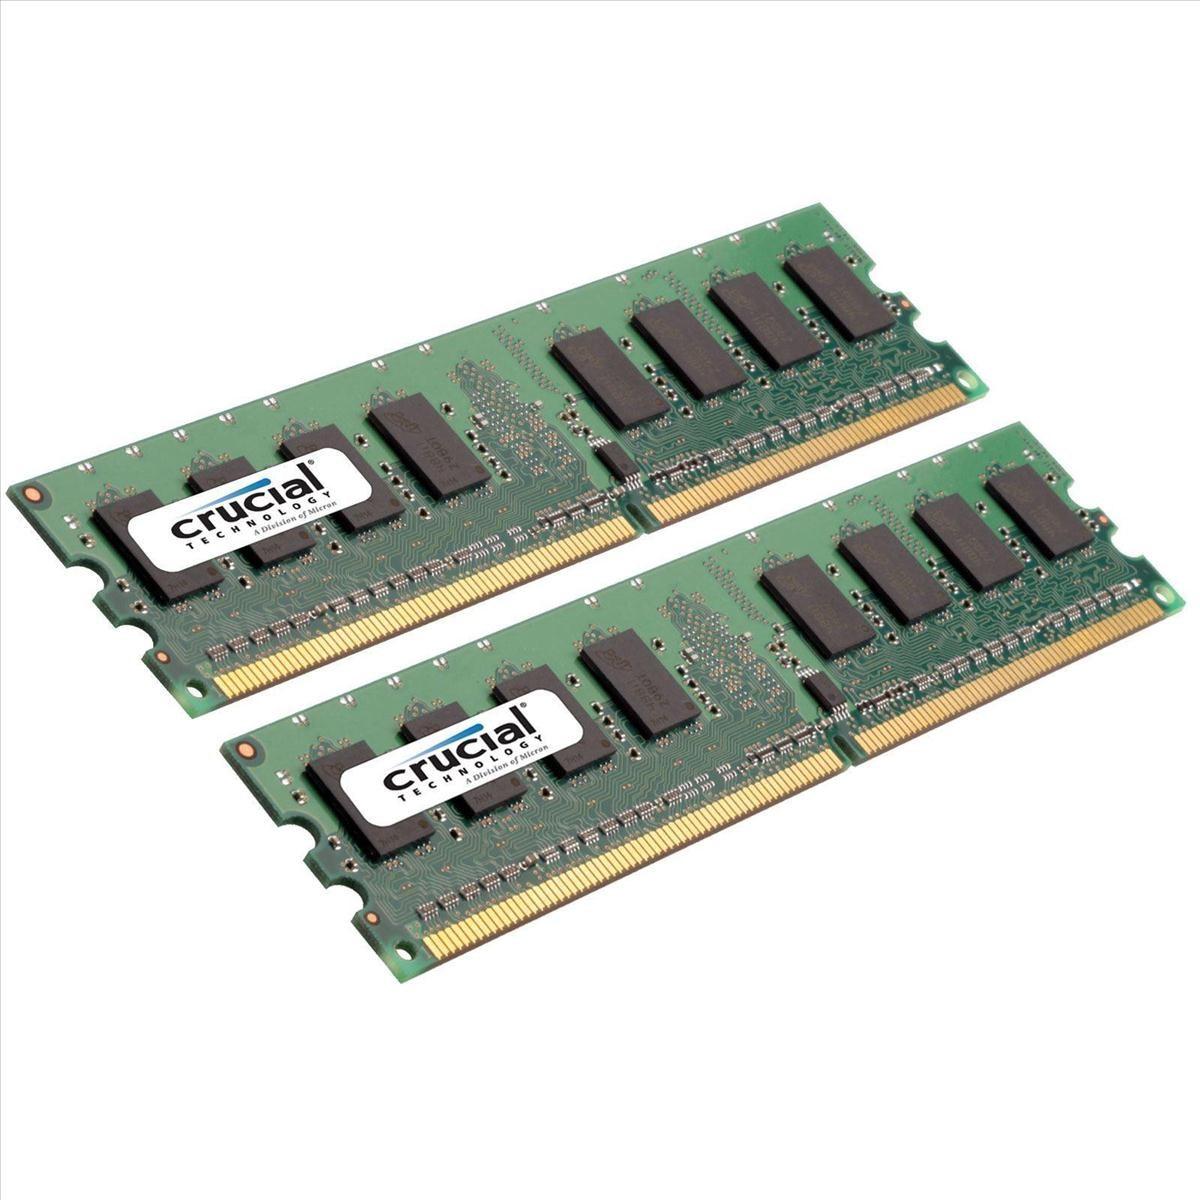 Crucial 4gb 2x 2gb 800mhz Ddr2 Ram Ct2kit25664aa800 Ccl Computers Memori Pc 1gb Pc2 6400 Kingston